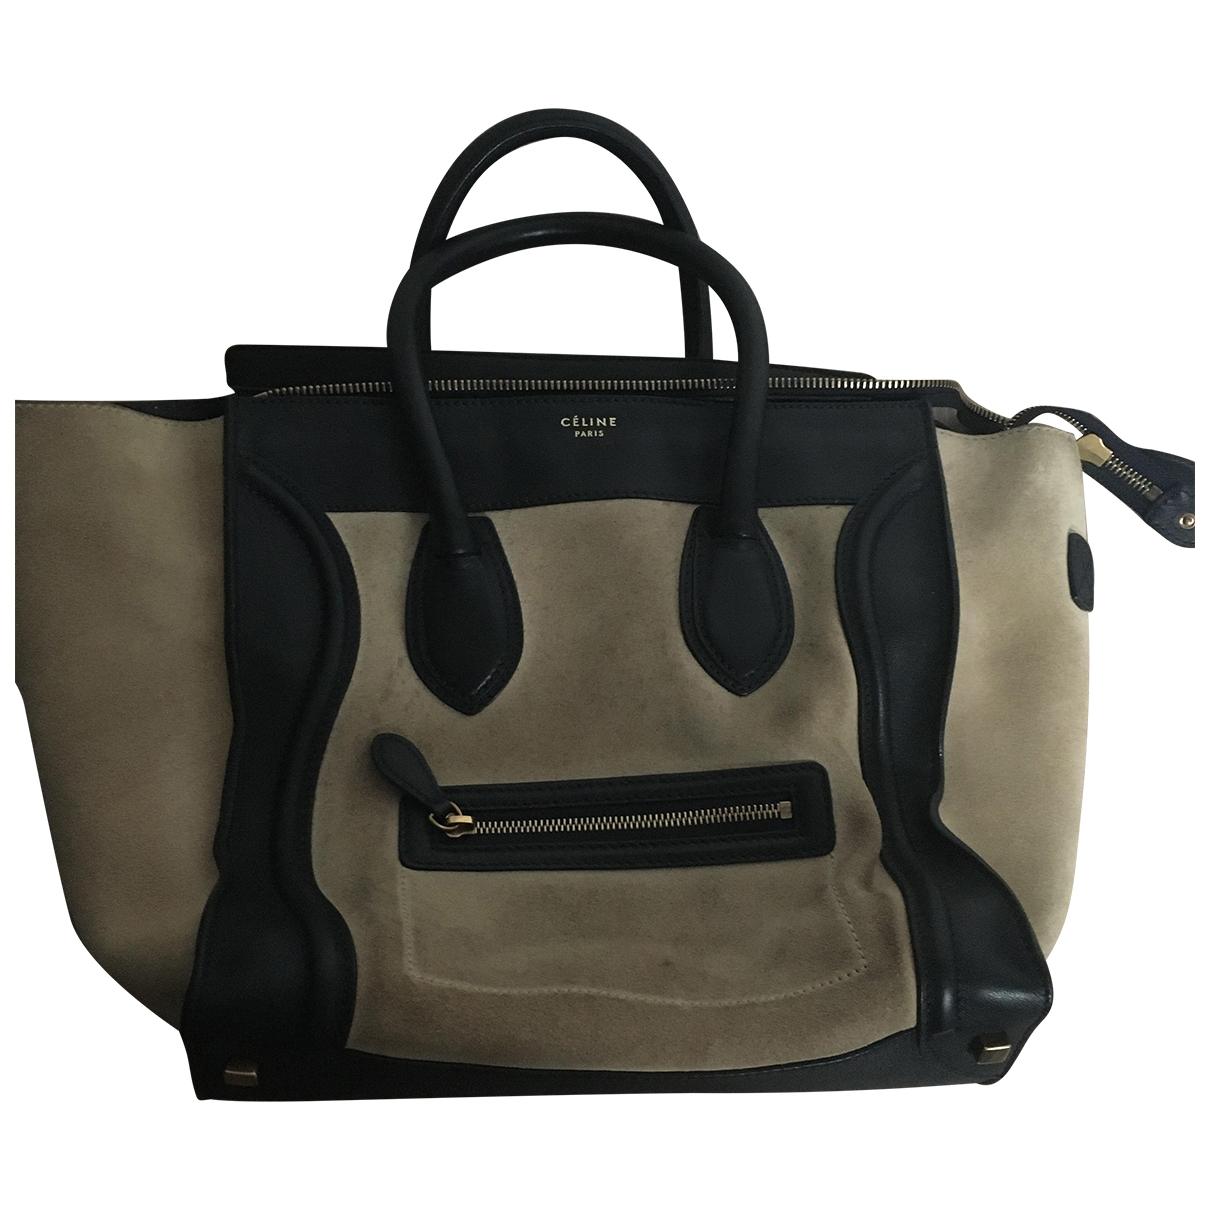 Celine Luggage Beige Suede handbag for Women \N